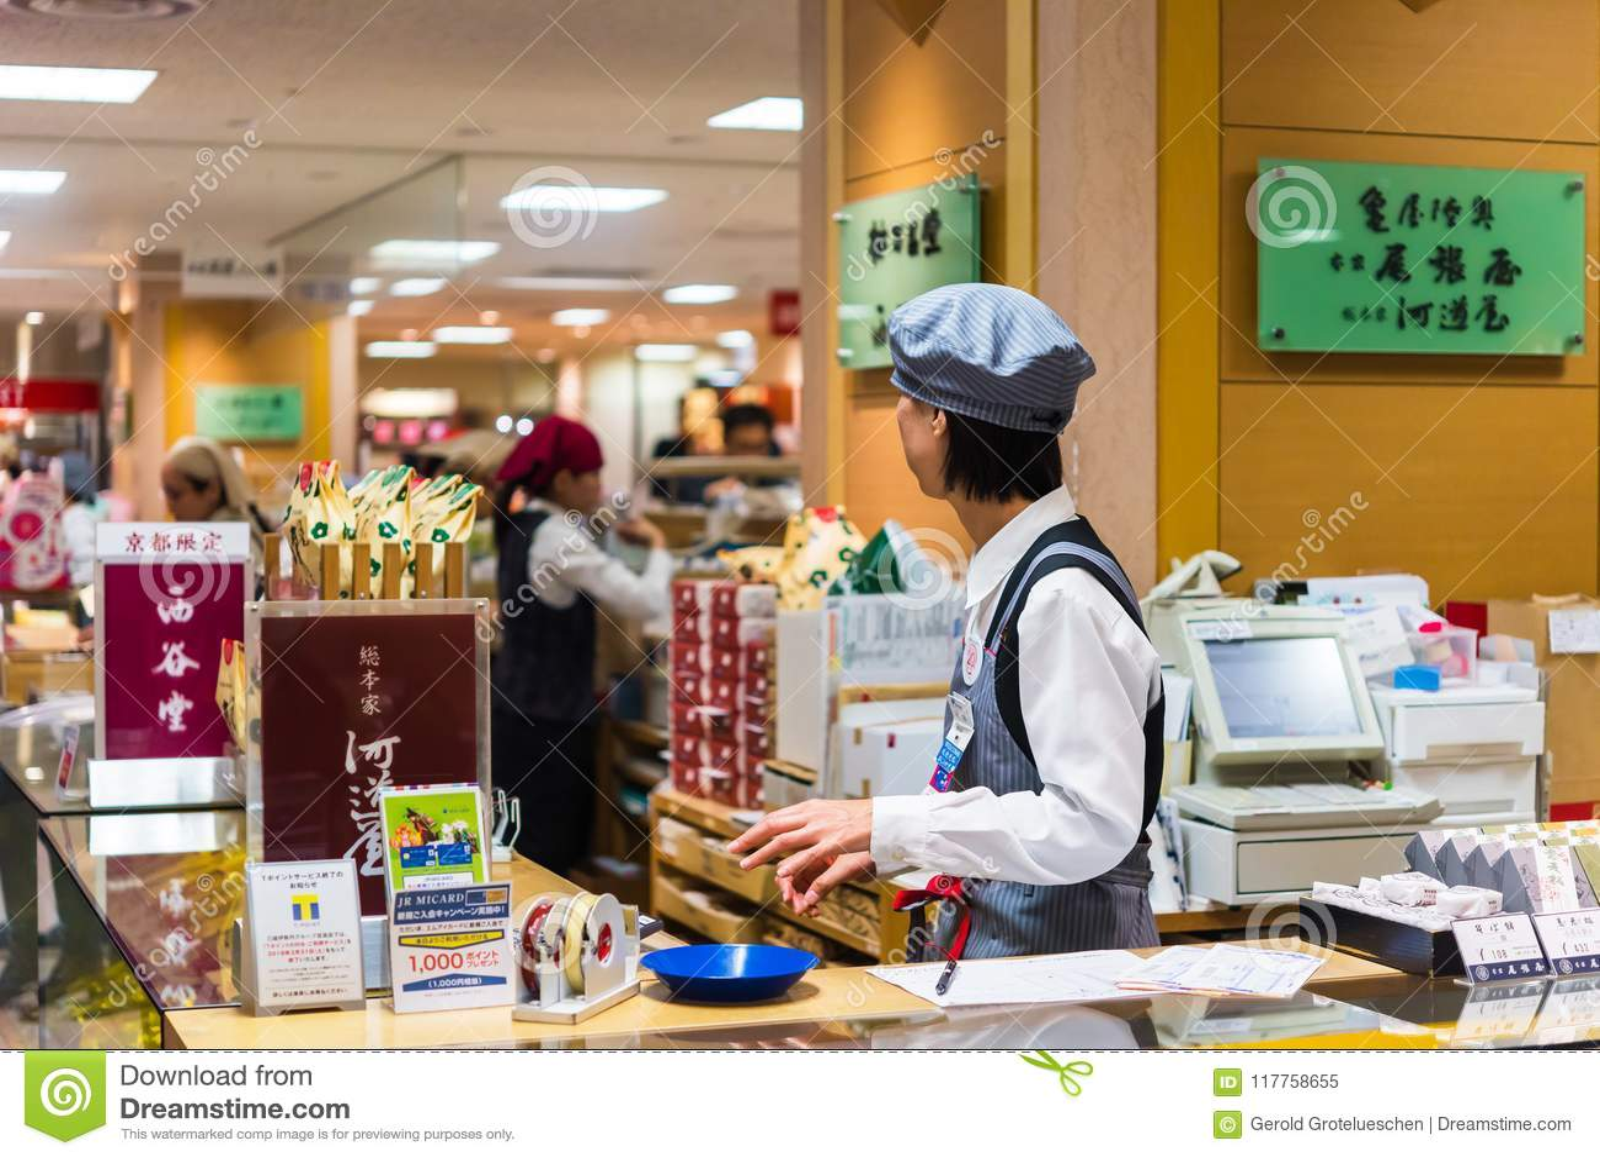 KYOTO, JAPAN - NOVEMBER 7, 2017: Worker at the ticket office at